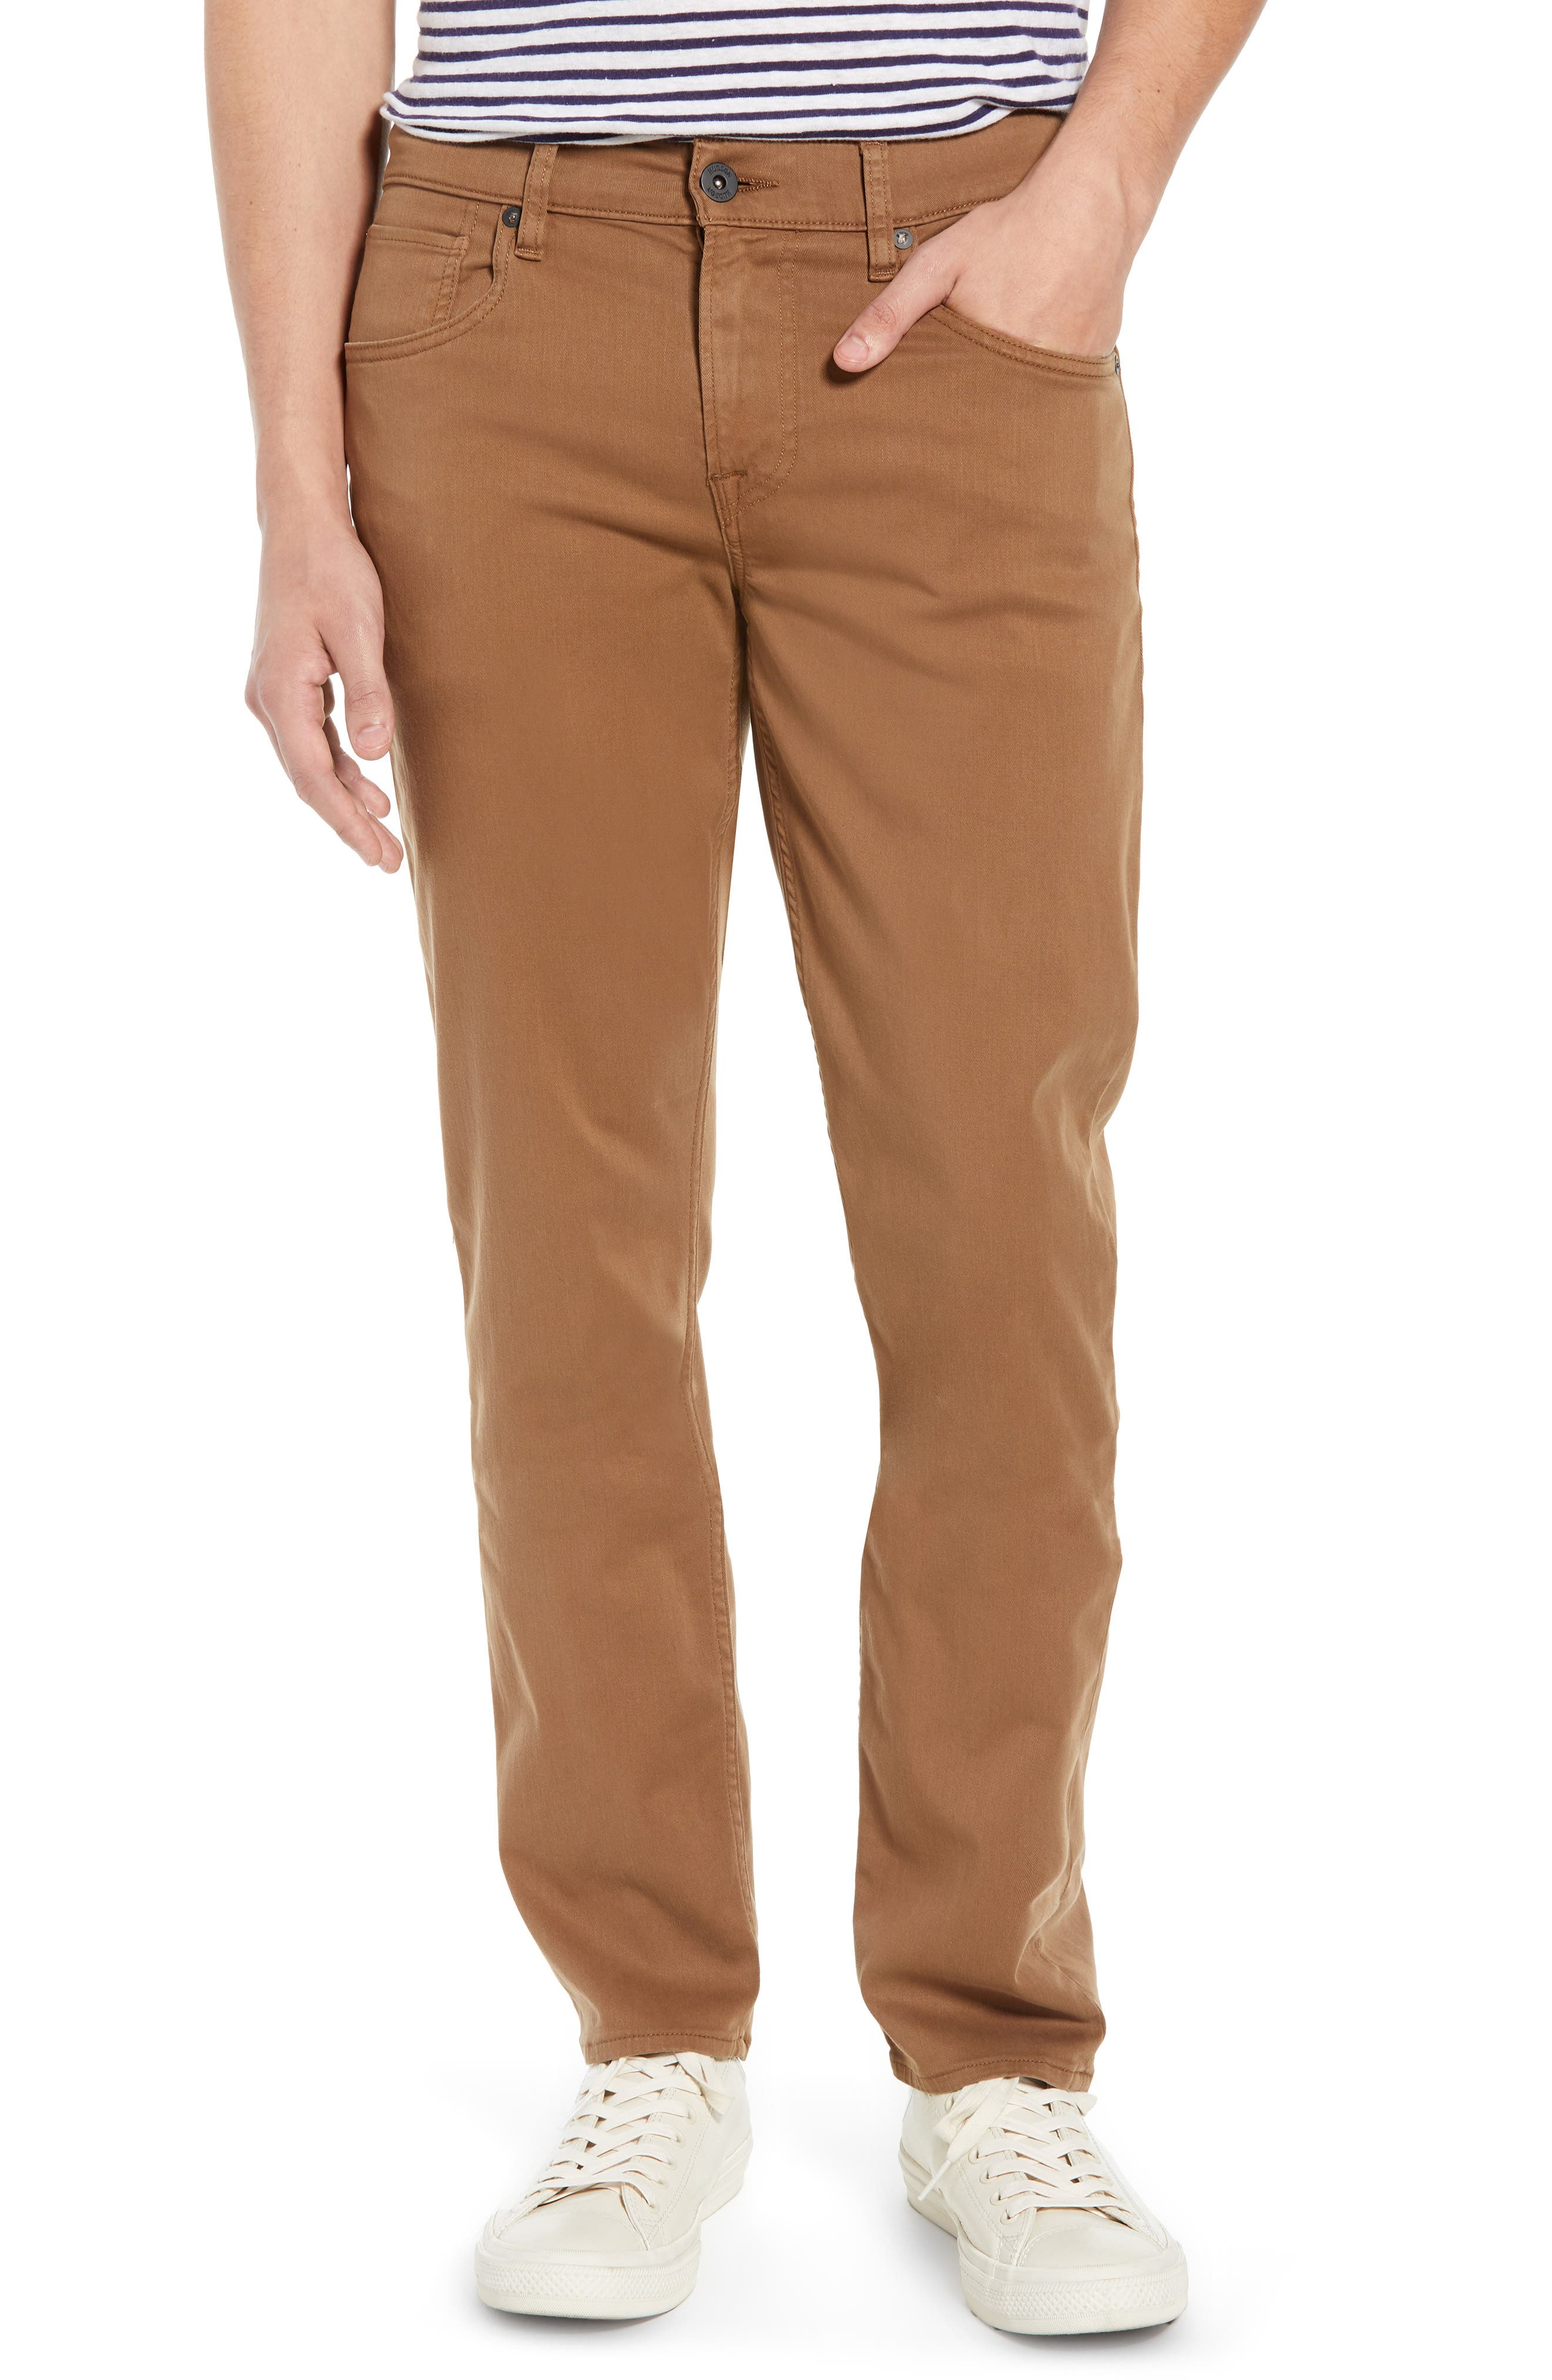 Hudson Blake Slim Fit Jeans,                             Main thumbnail 1, color,                             SIENNA